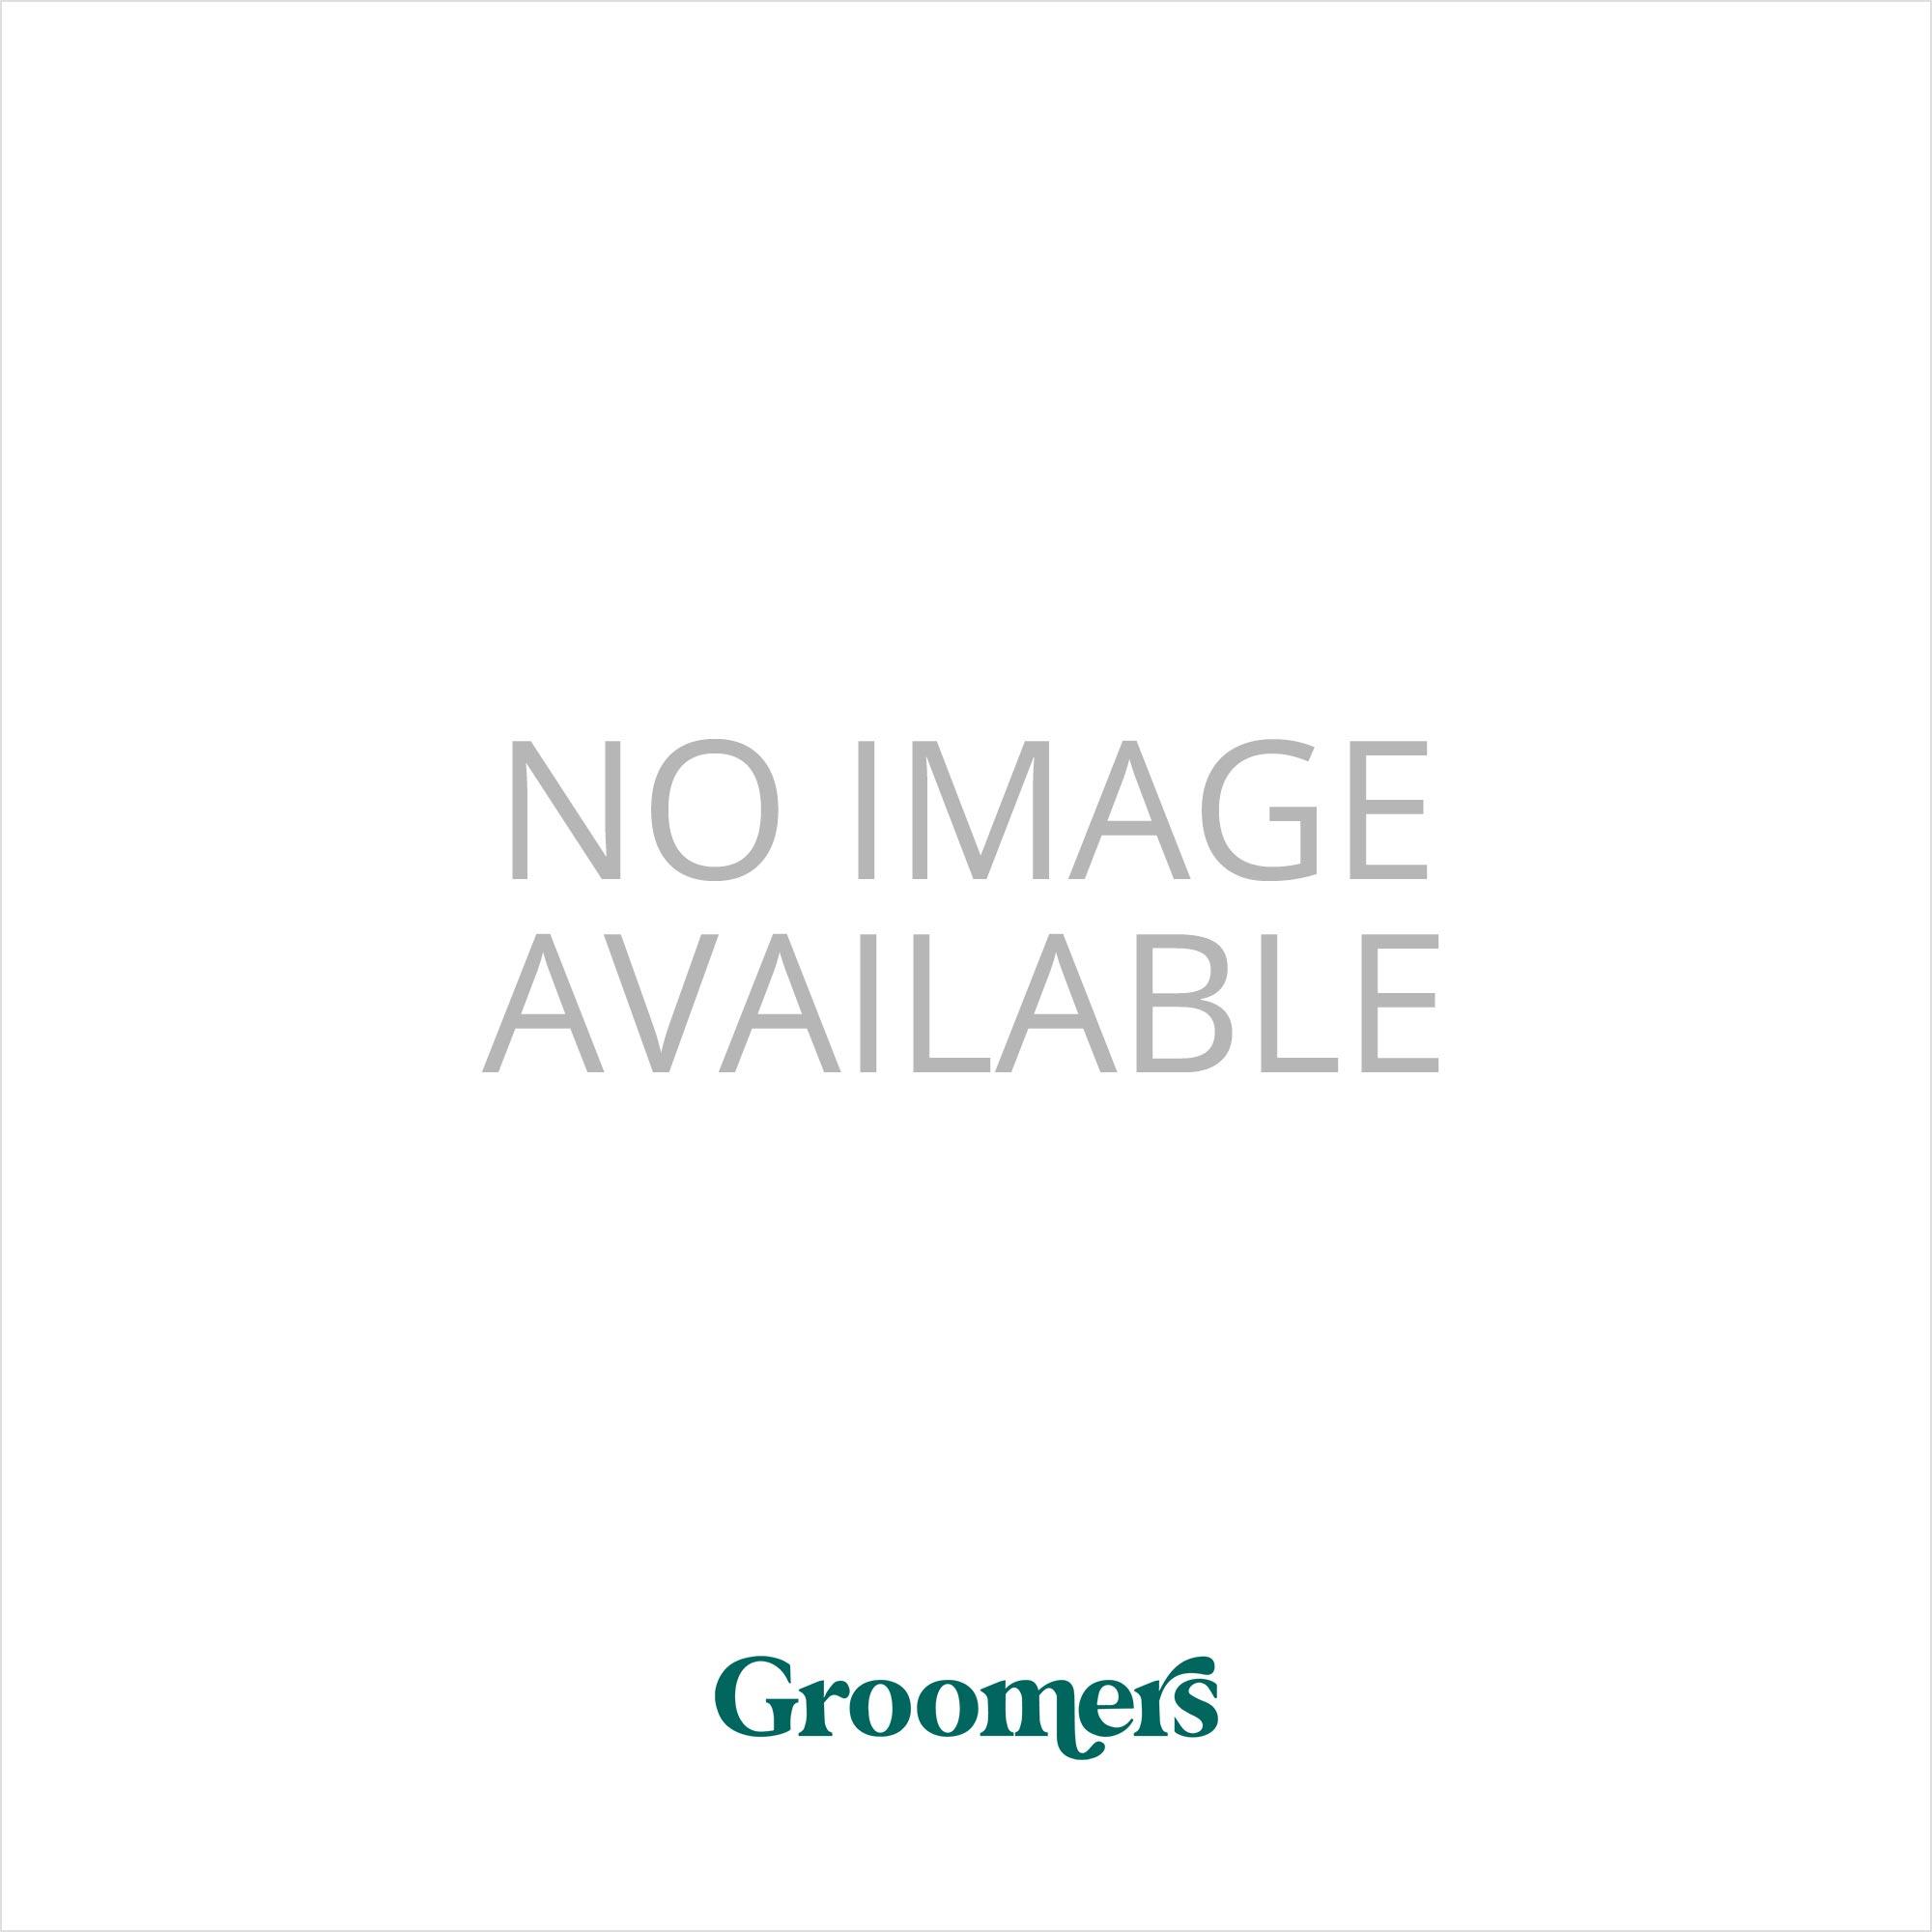 Round Pressure Grooming Table